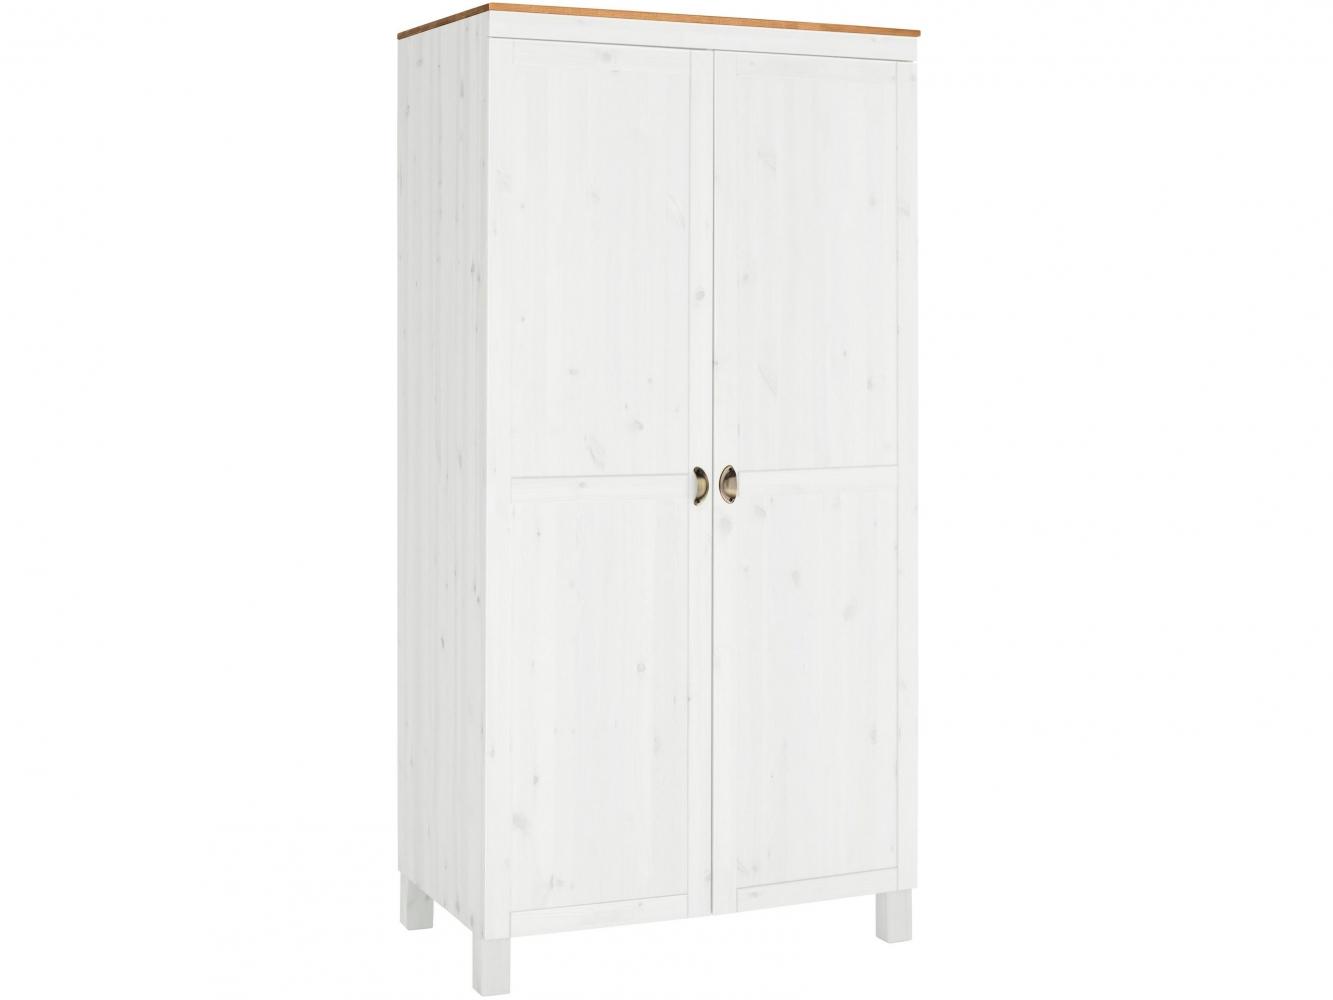 Šatní skříň Onea I., 205 cm, borovice / bílá